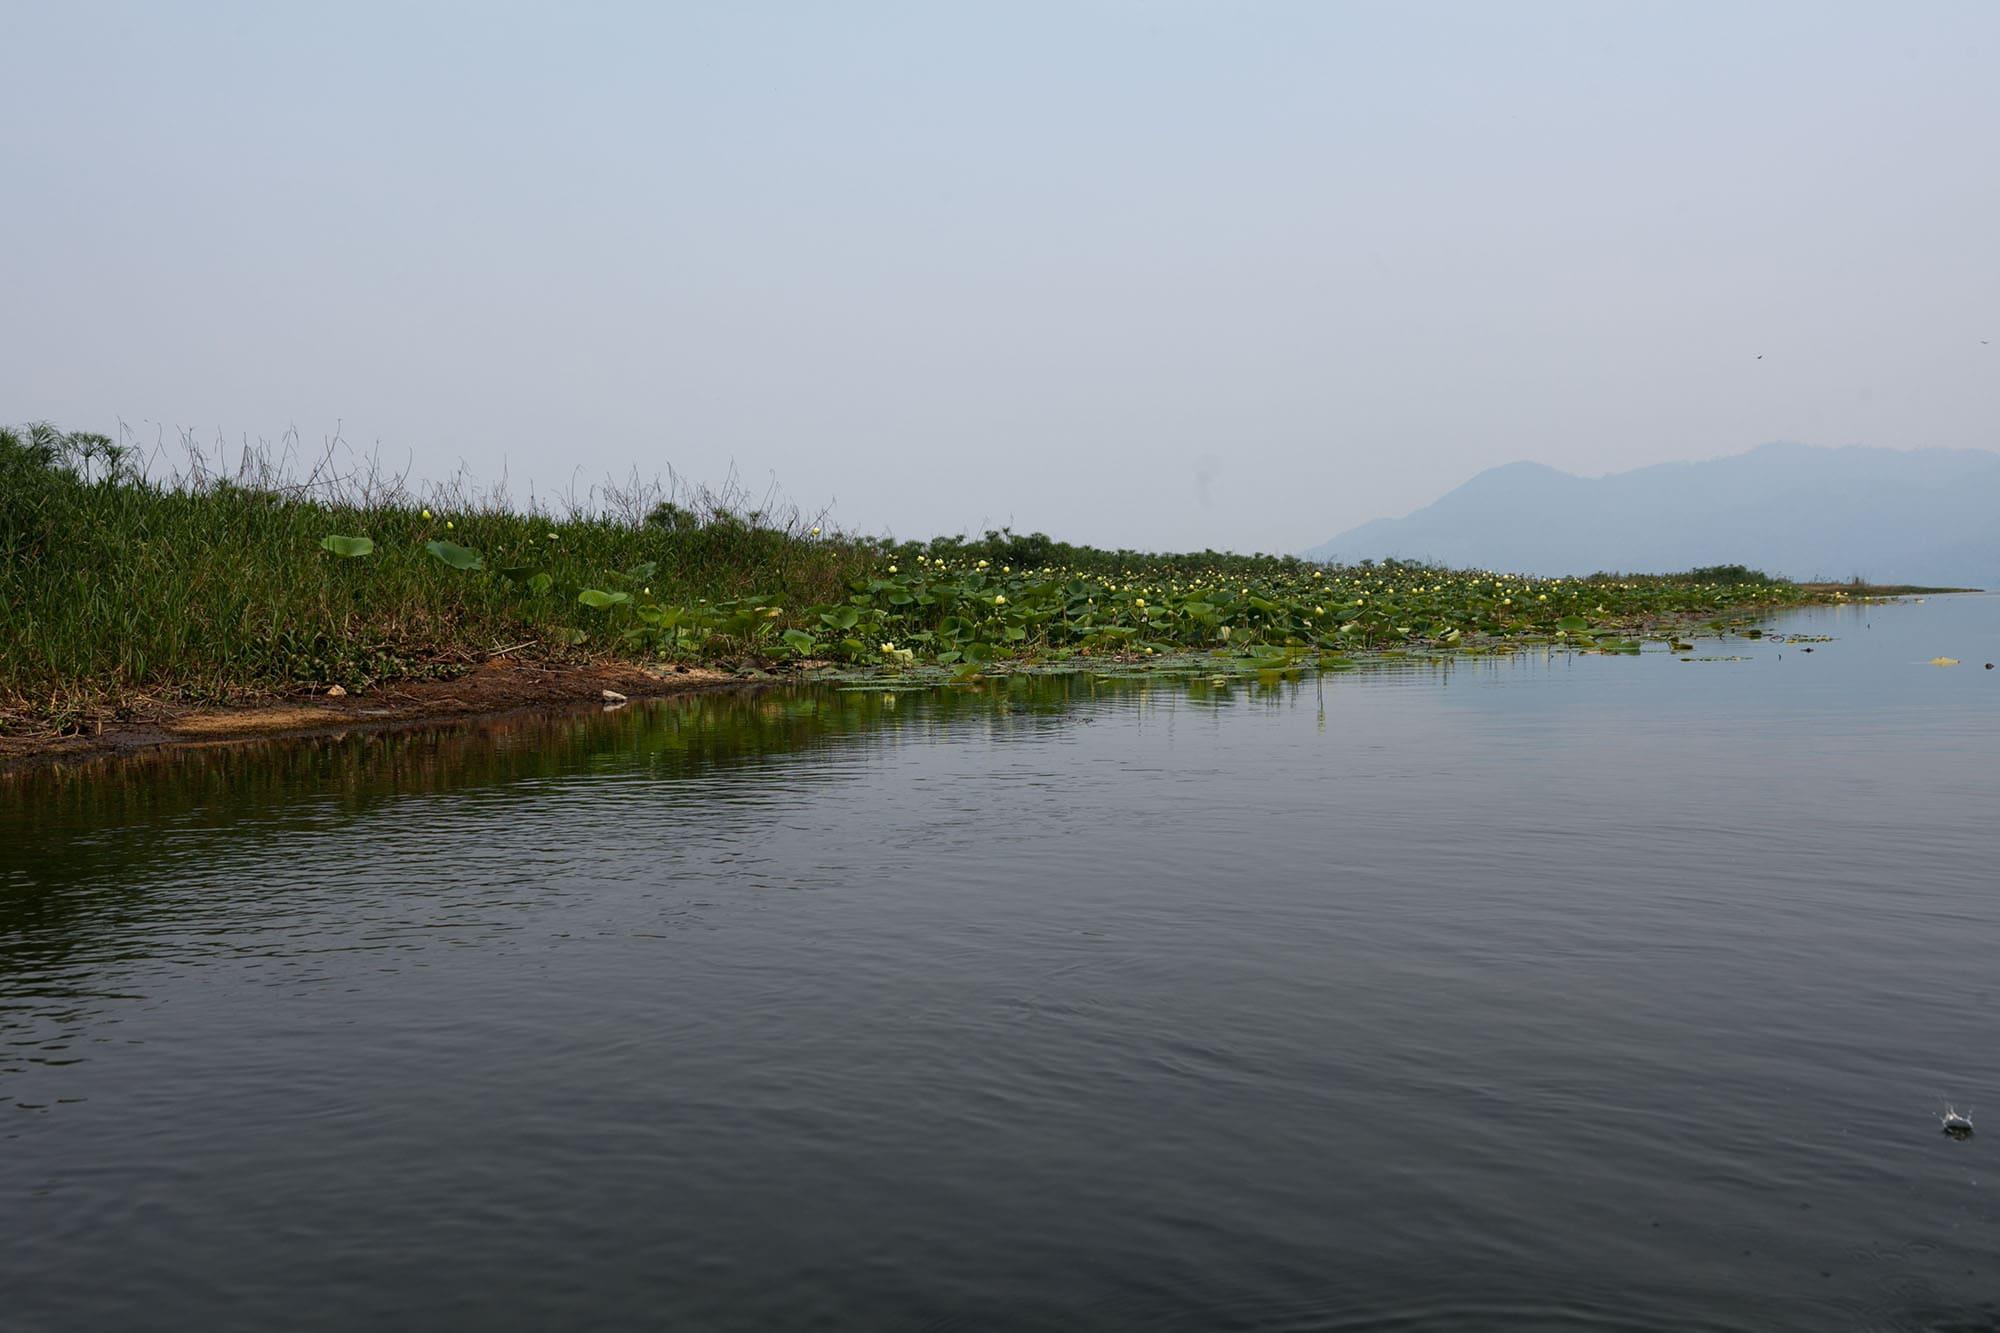 Rowing on the lake in Lago de Yajoa, Honduras